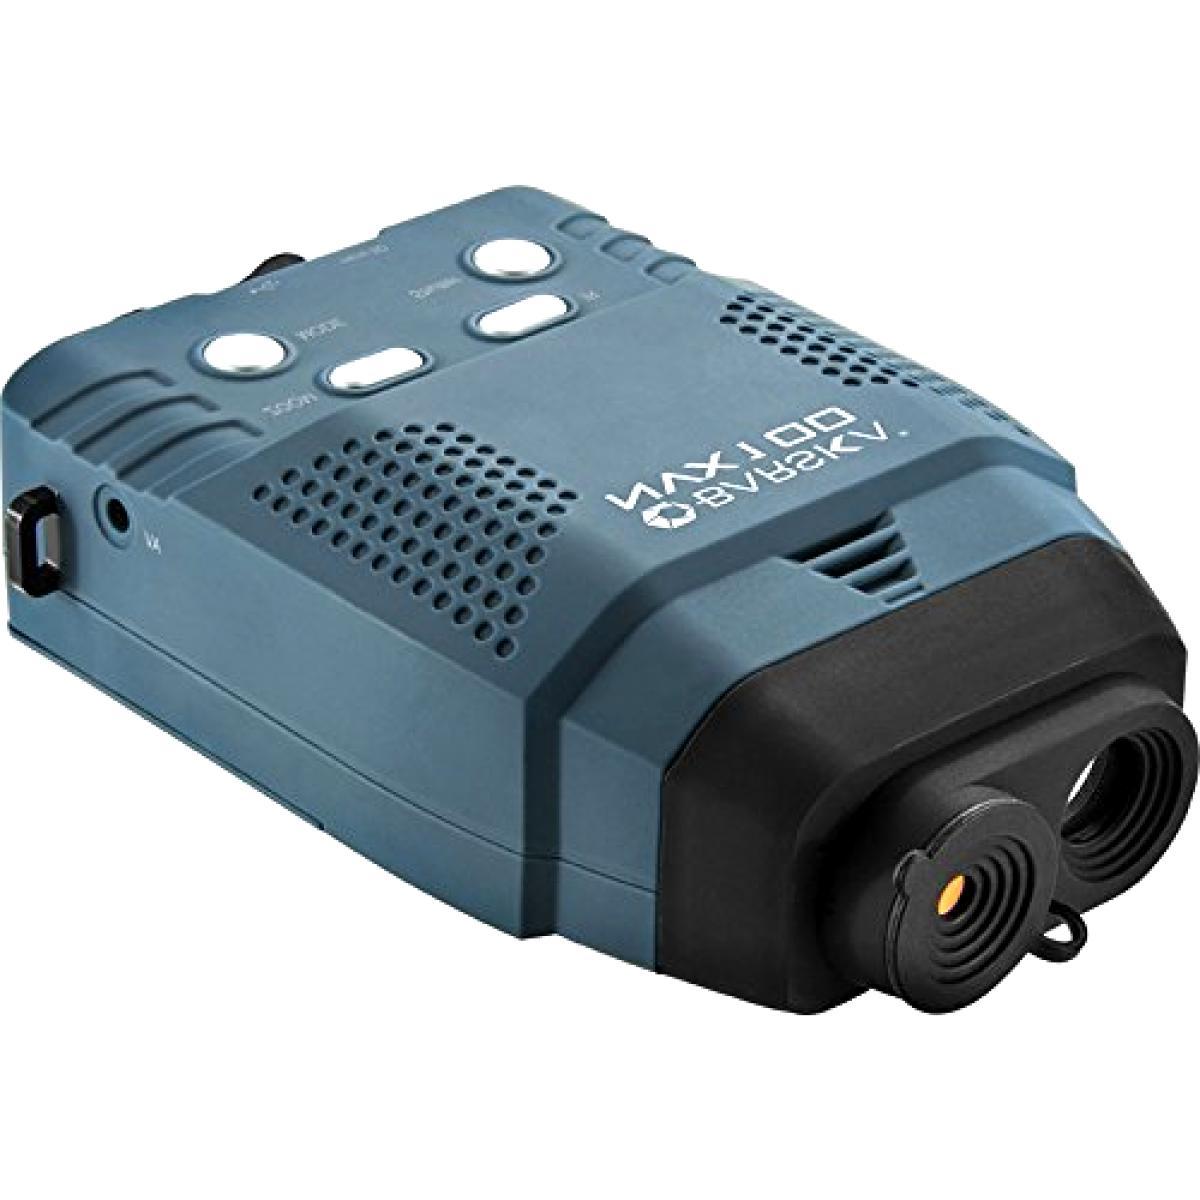 3x digital night vision monocular optics scope